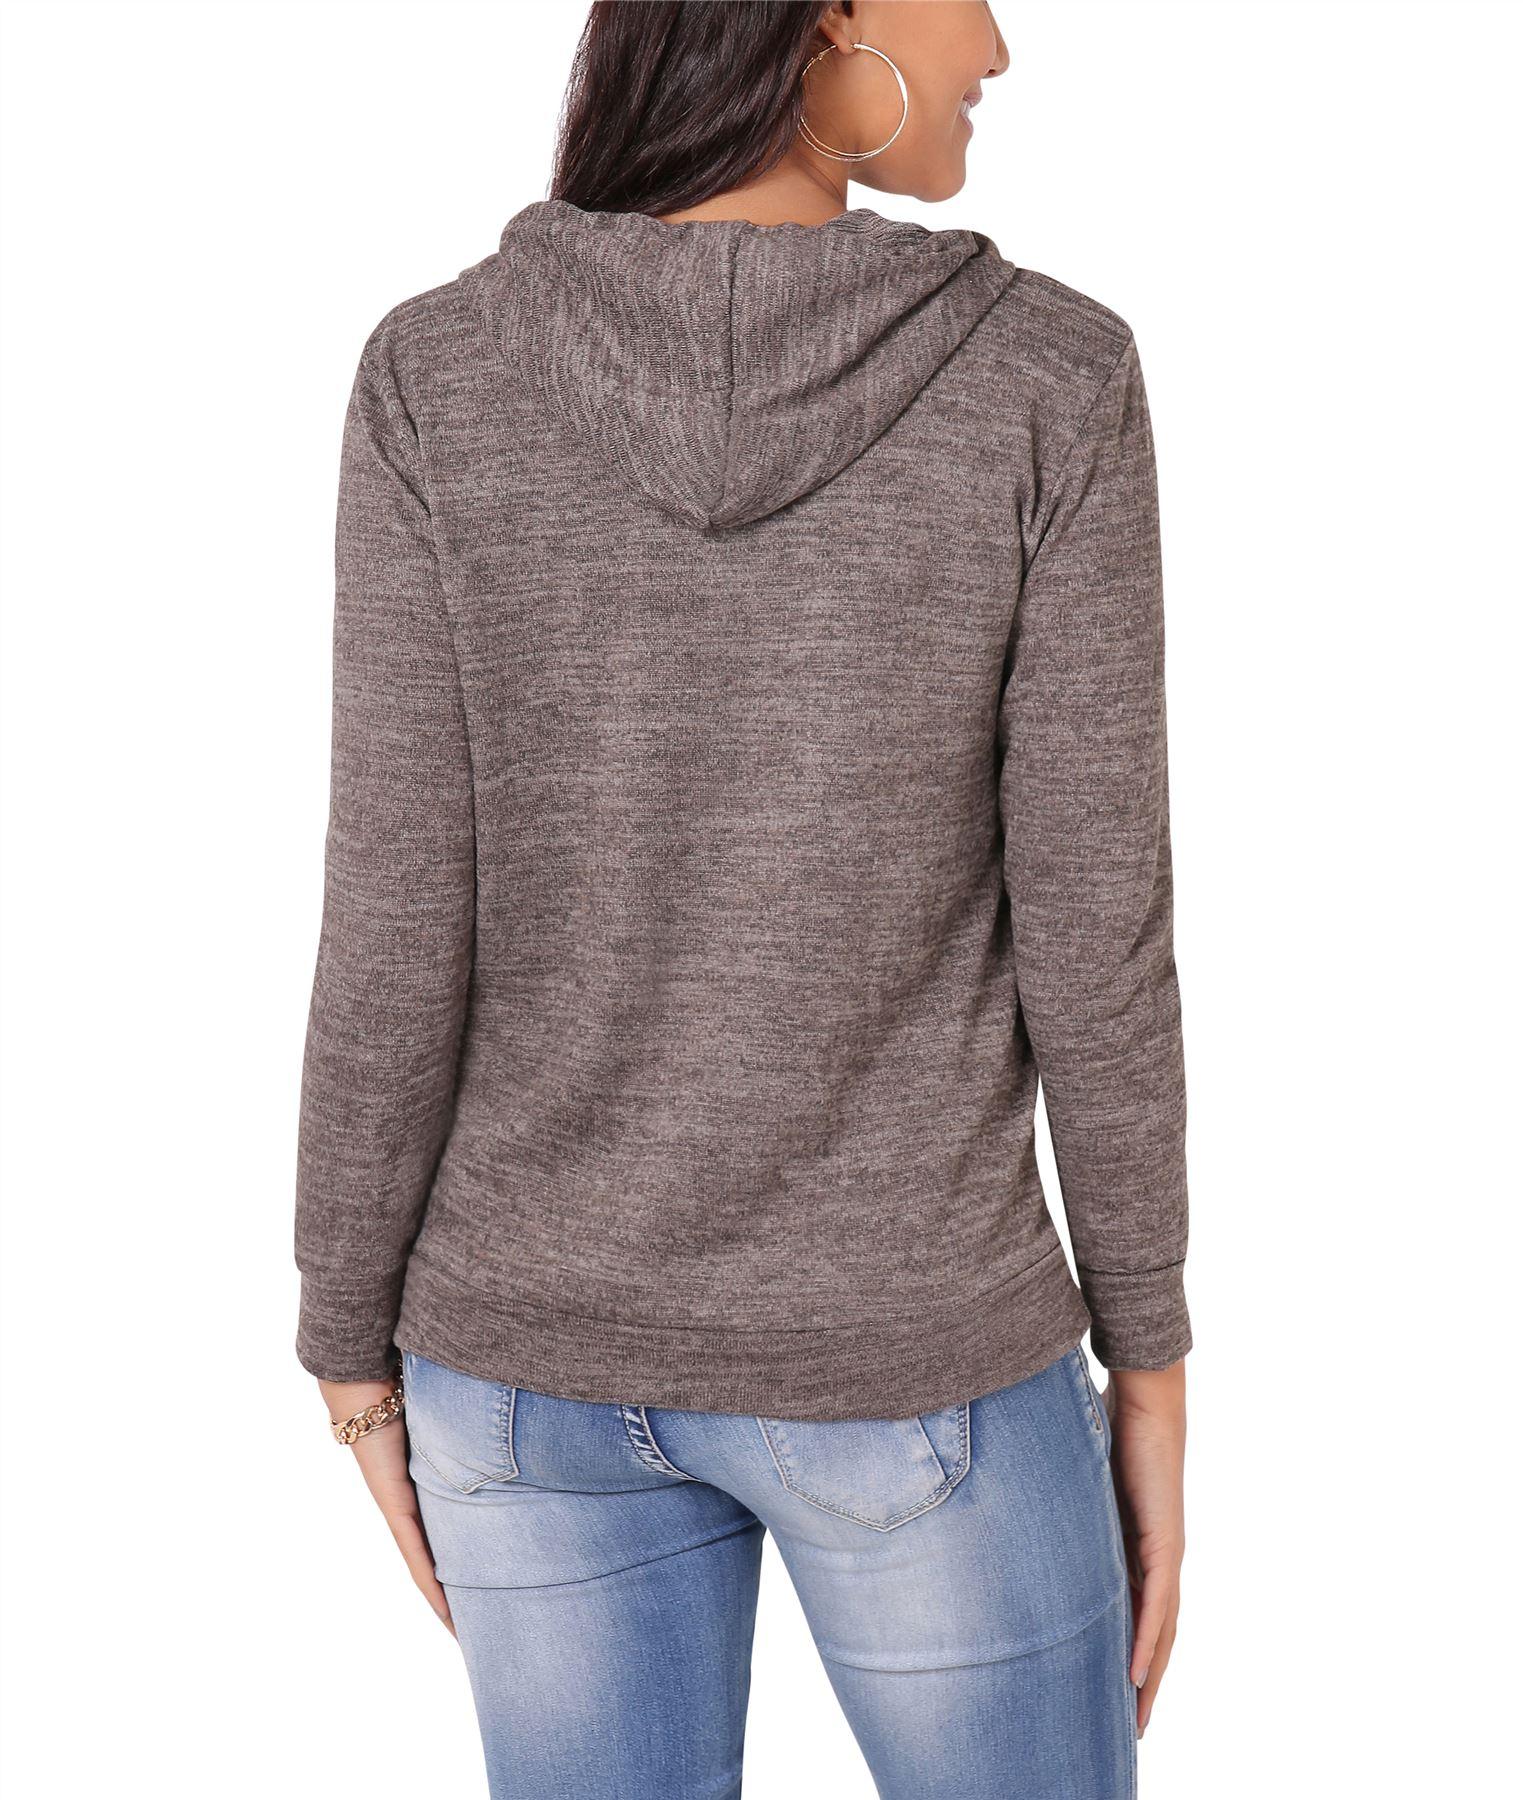 Womens-Soft-Marl-Knit-Hoodie-Hooded-Loose-Baggy-Jumper-Sweater-Top-Sweatshirt thumbnail 13